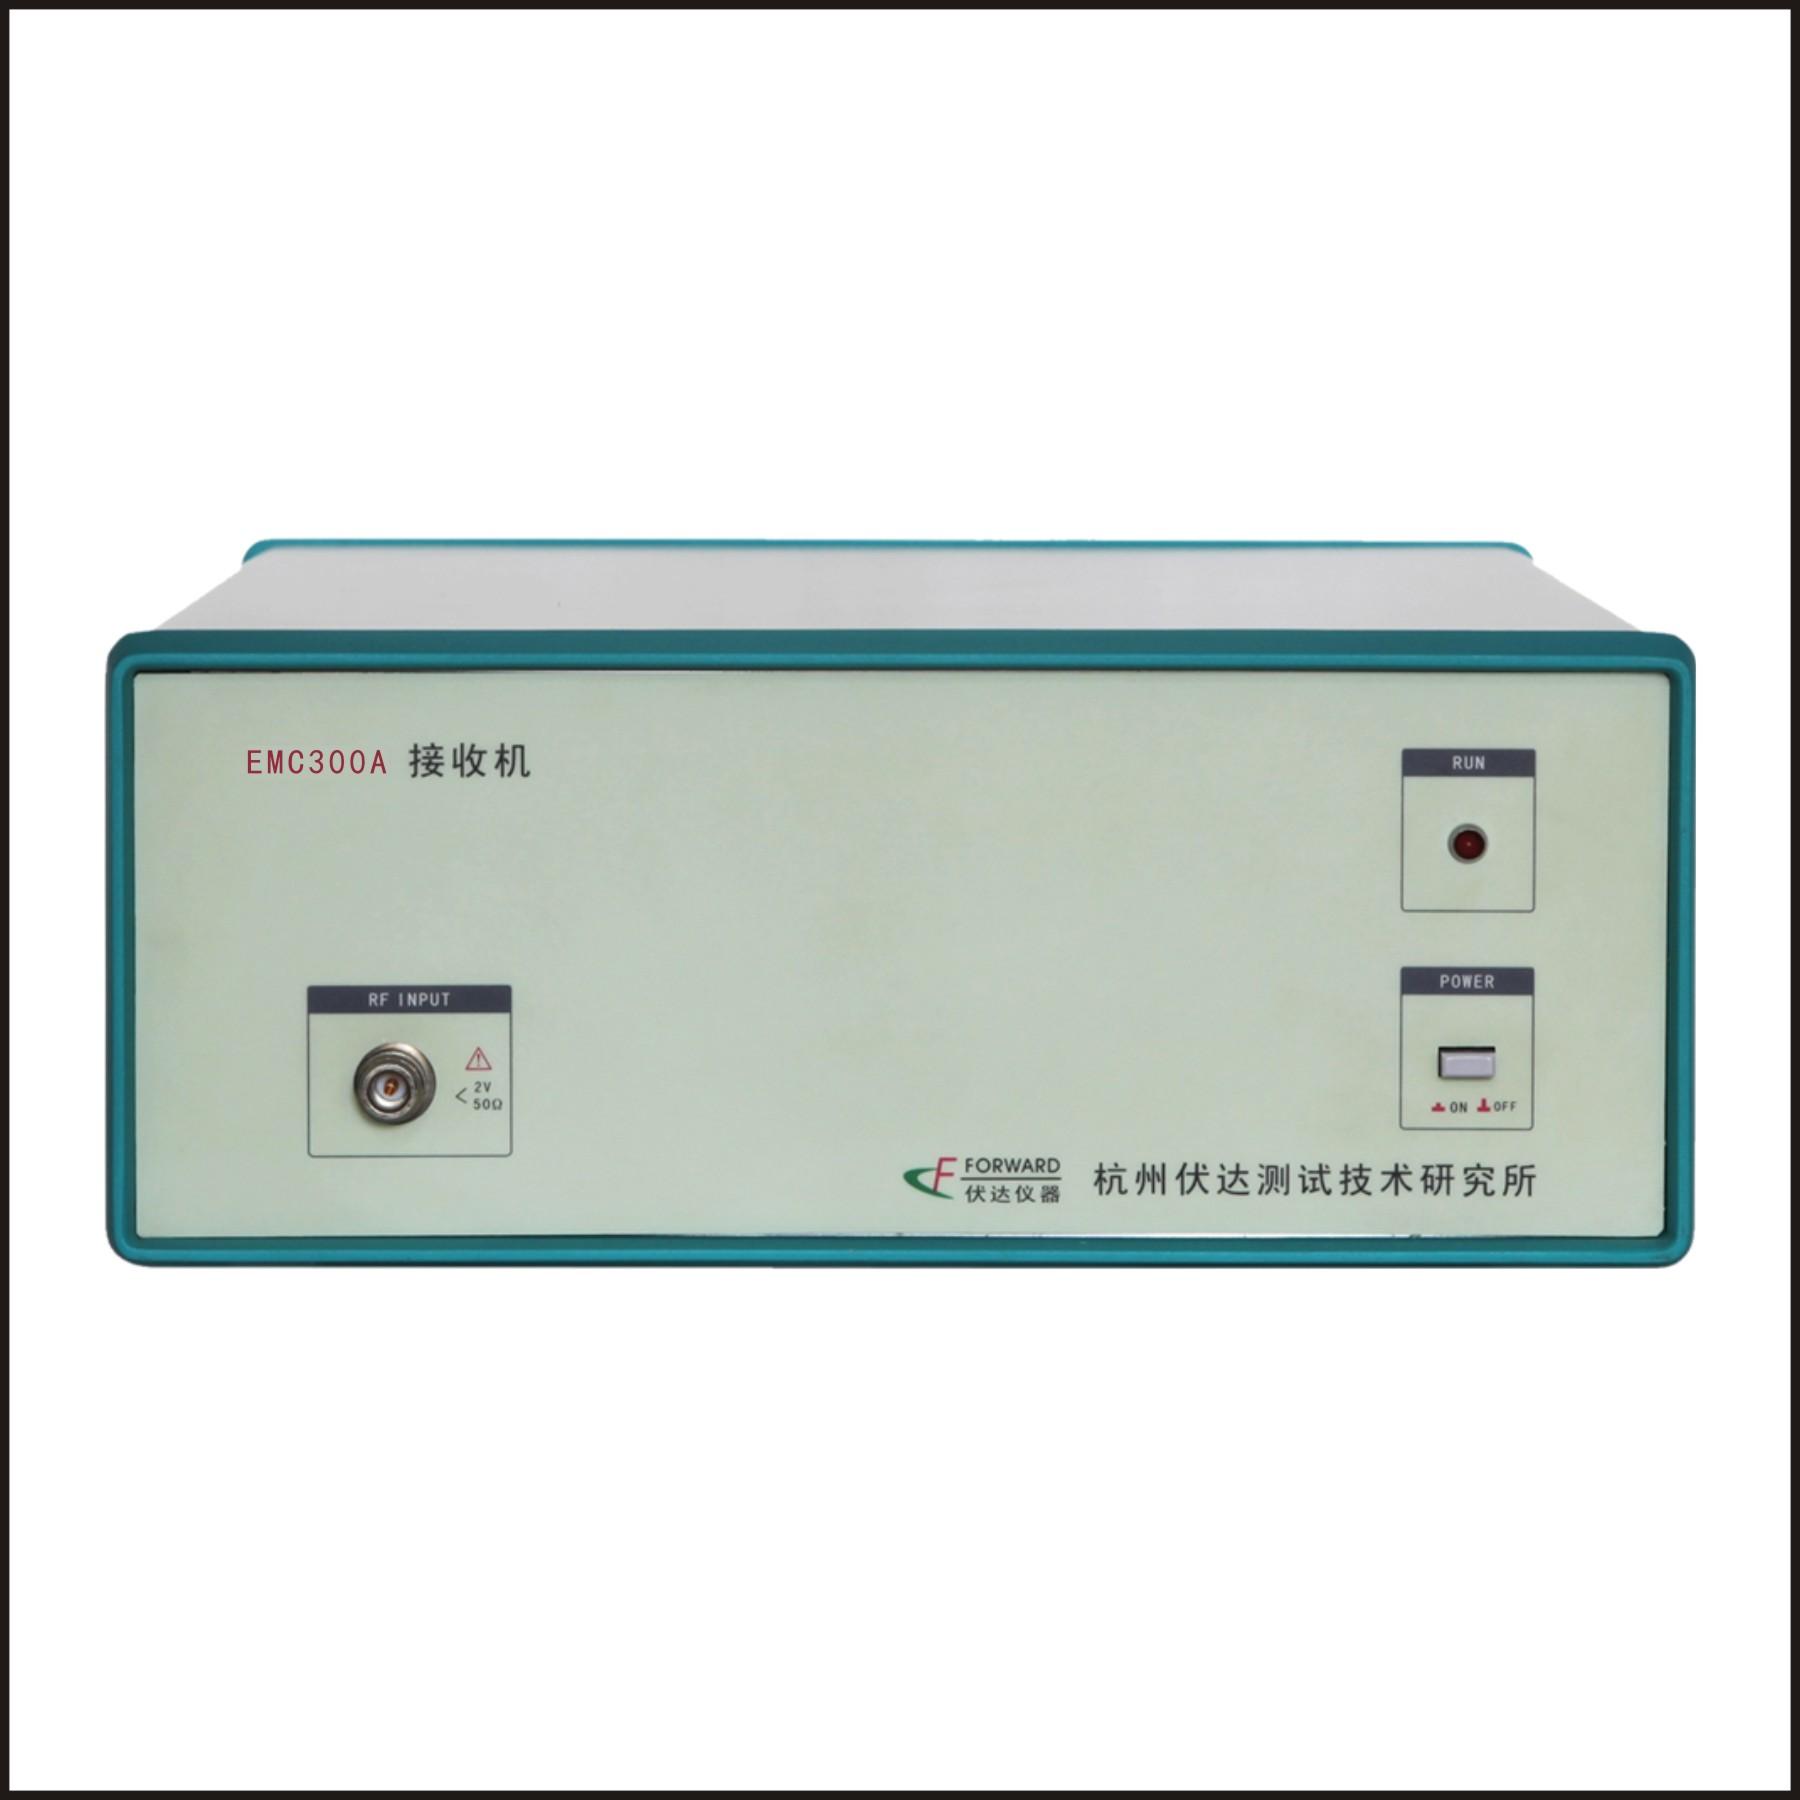 EMC300A 电磁兼容•传导干扰测试系统